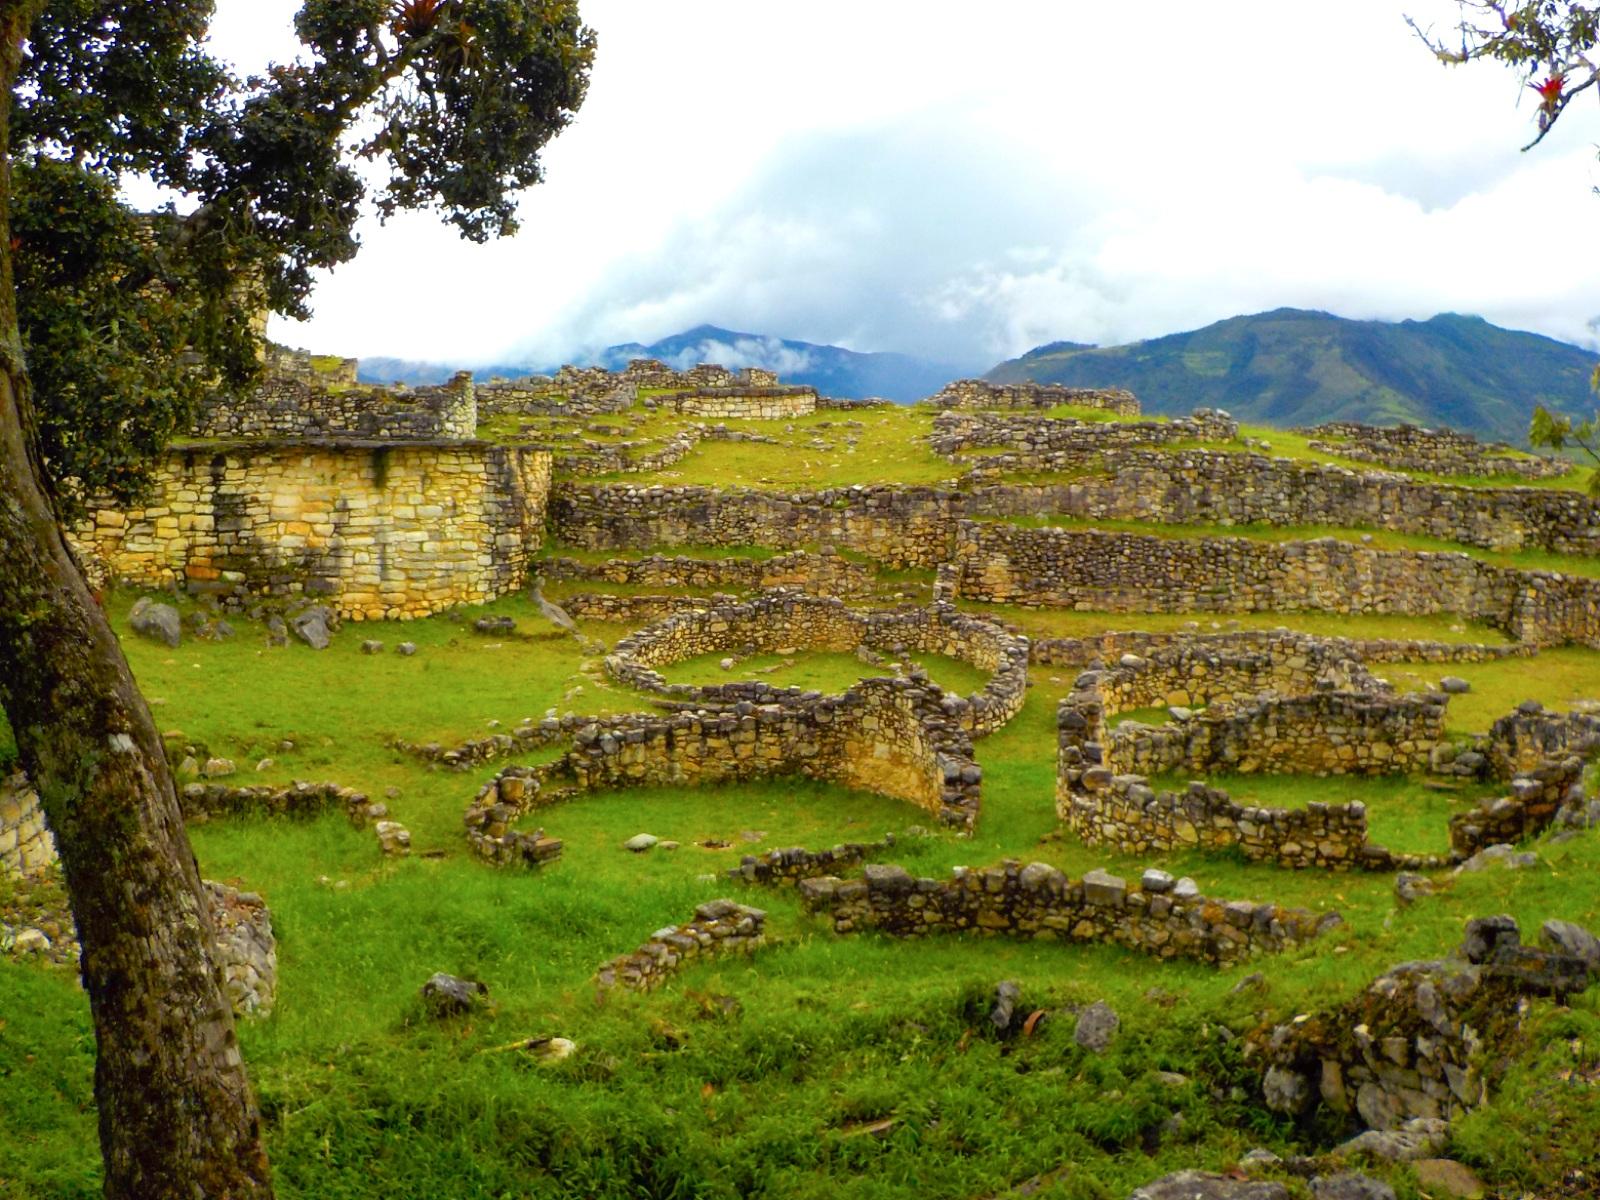 Kuelap, Chachapoyas, Perú